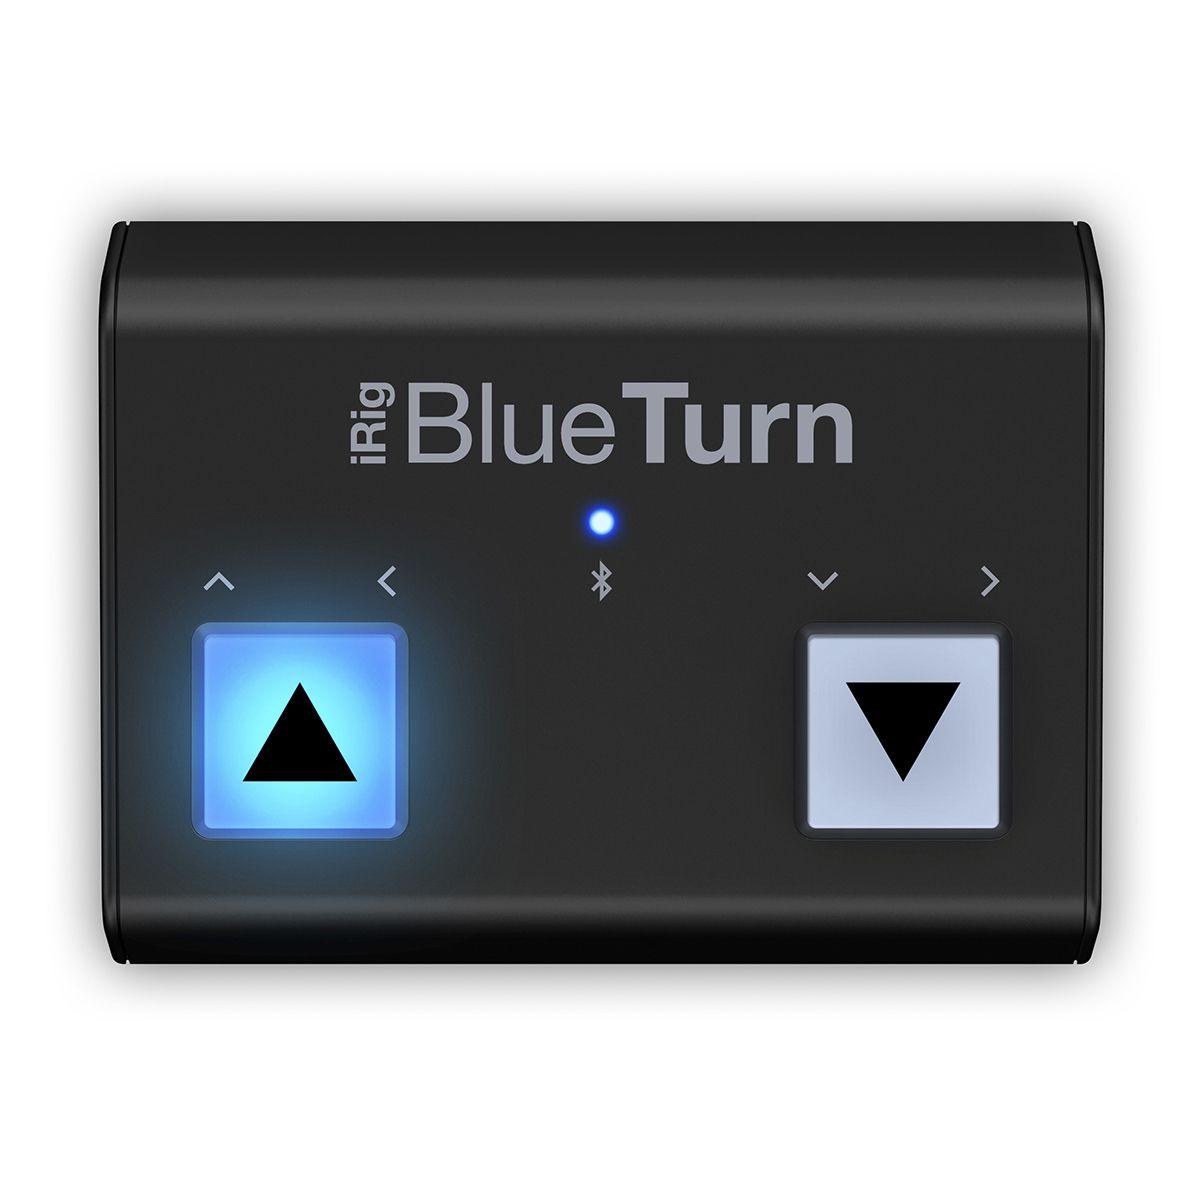 Pedal Controlador IK Multimedia iRig Blue Turn Bluetooth